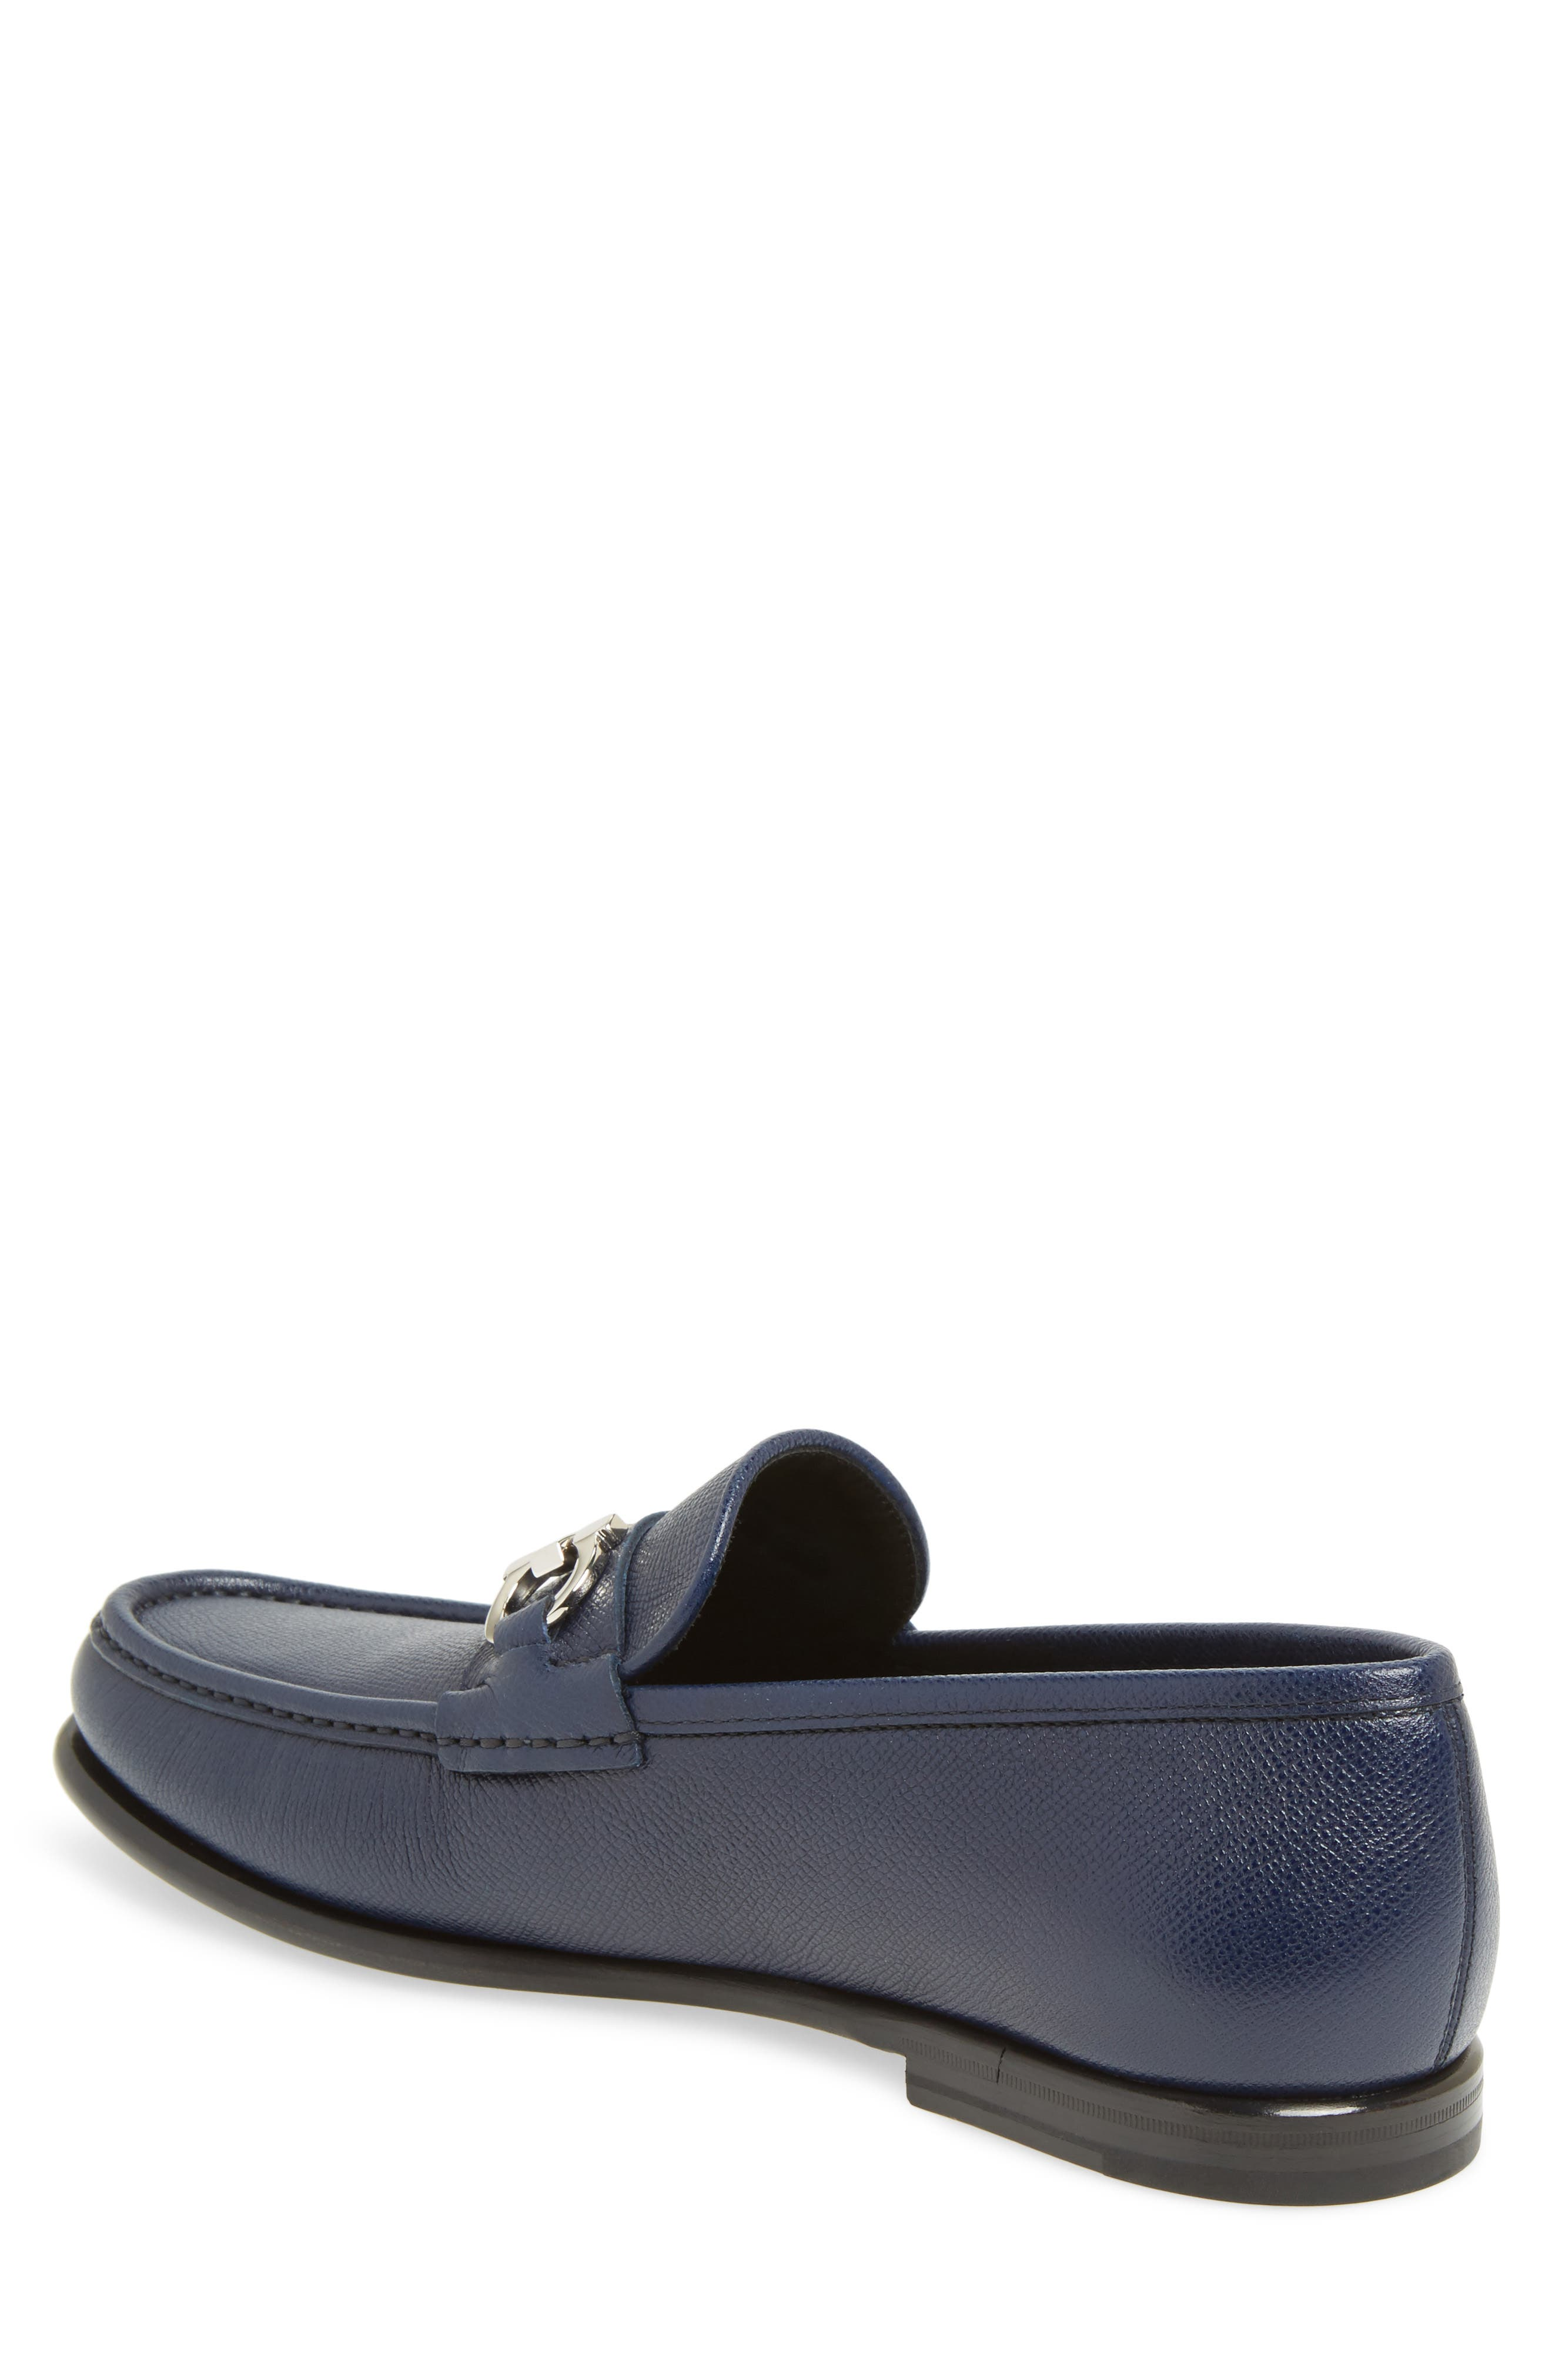 Alternate Image 2  - Salvatore Ferragamo Crown Bit Loafer (Men)